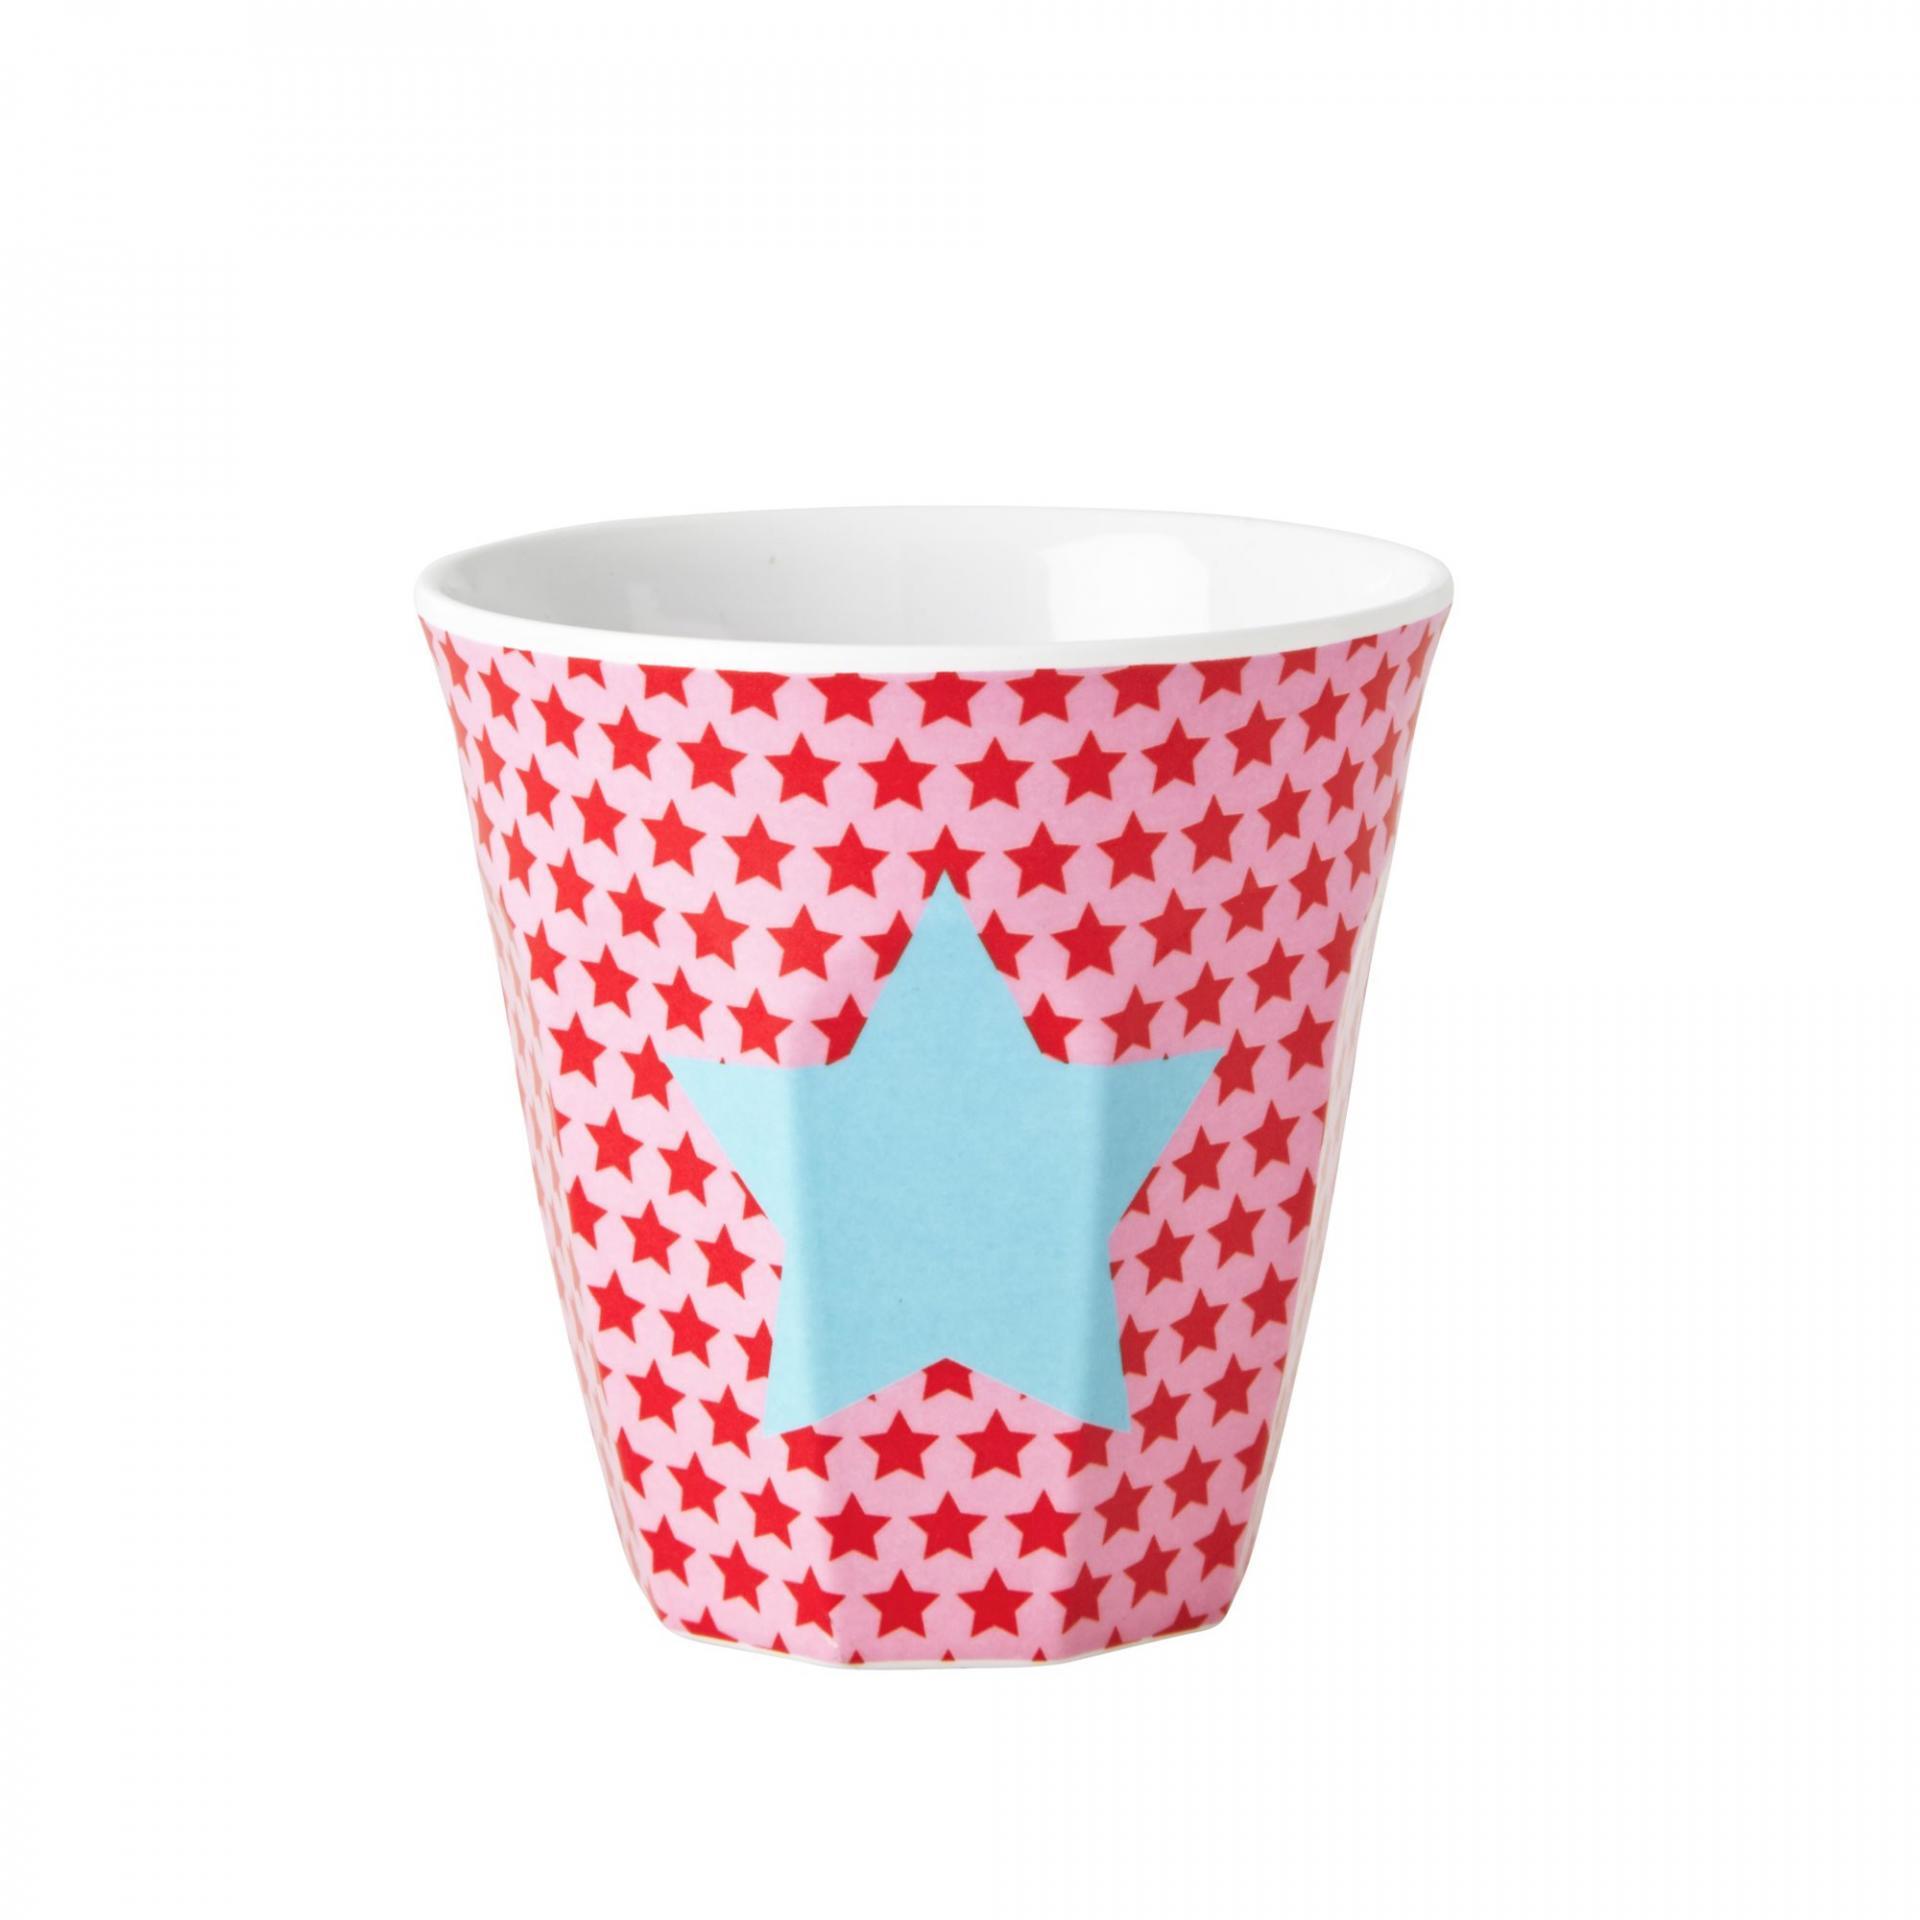 rice Melaminový pohárek Girls star, červená barva, modrá barva, plast